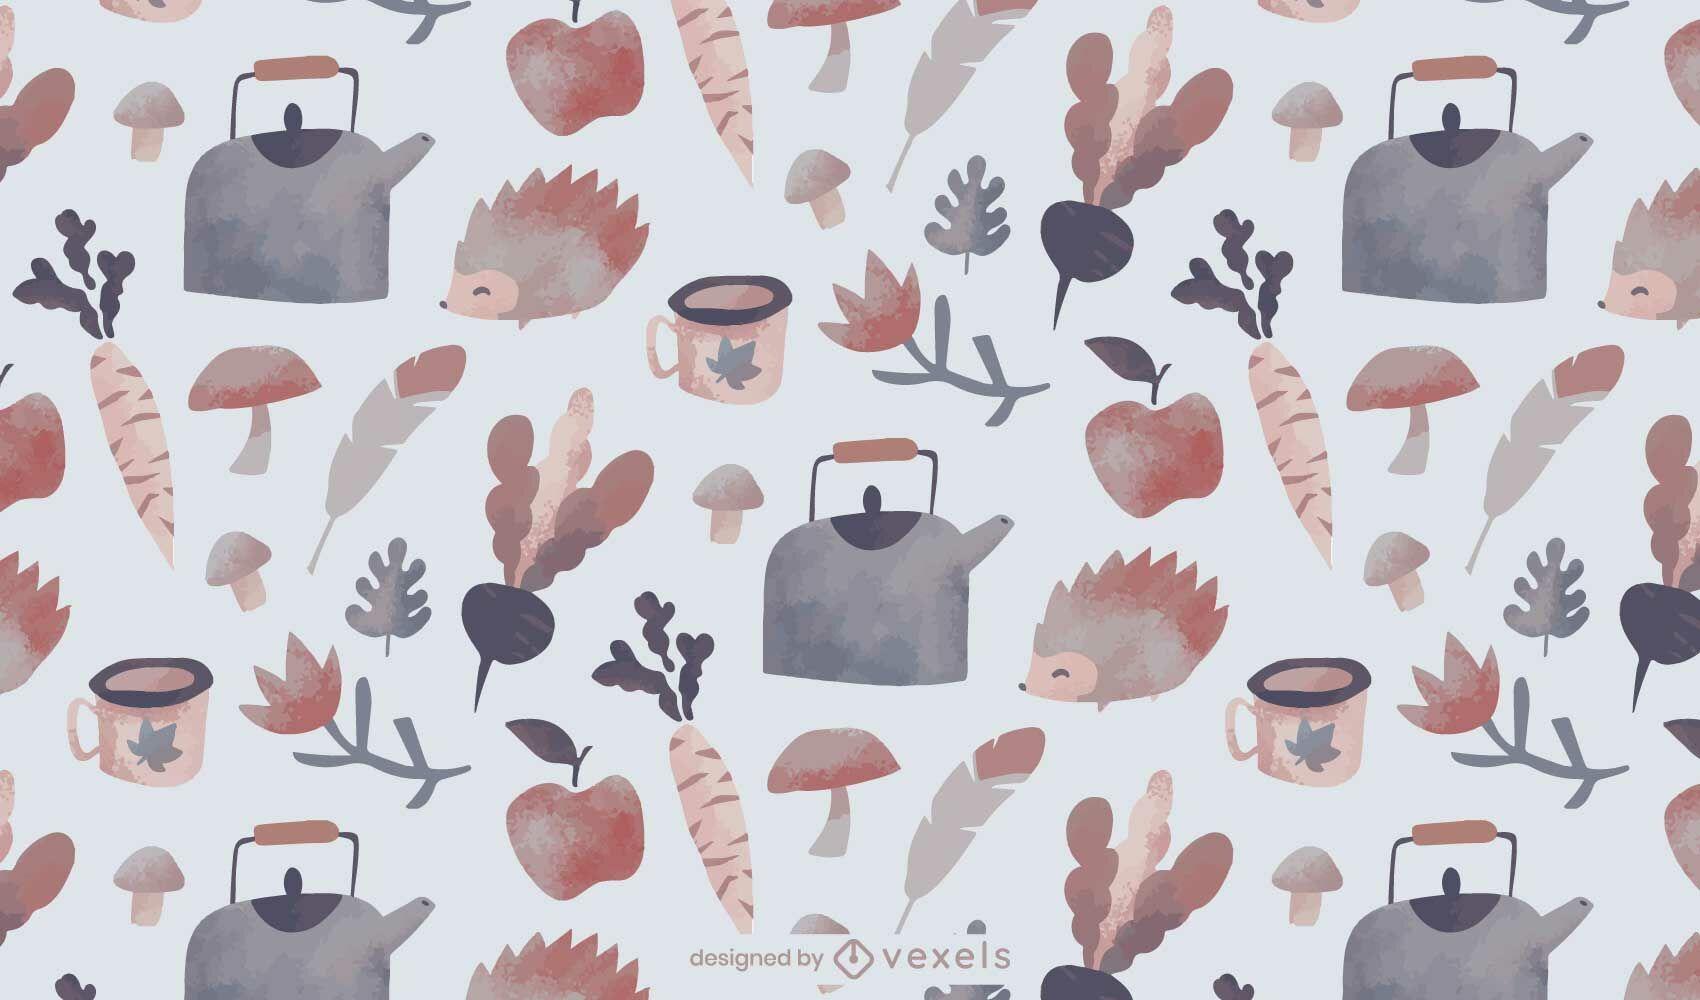 Cozy winter watercolor pattern design